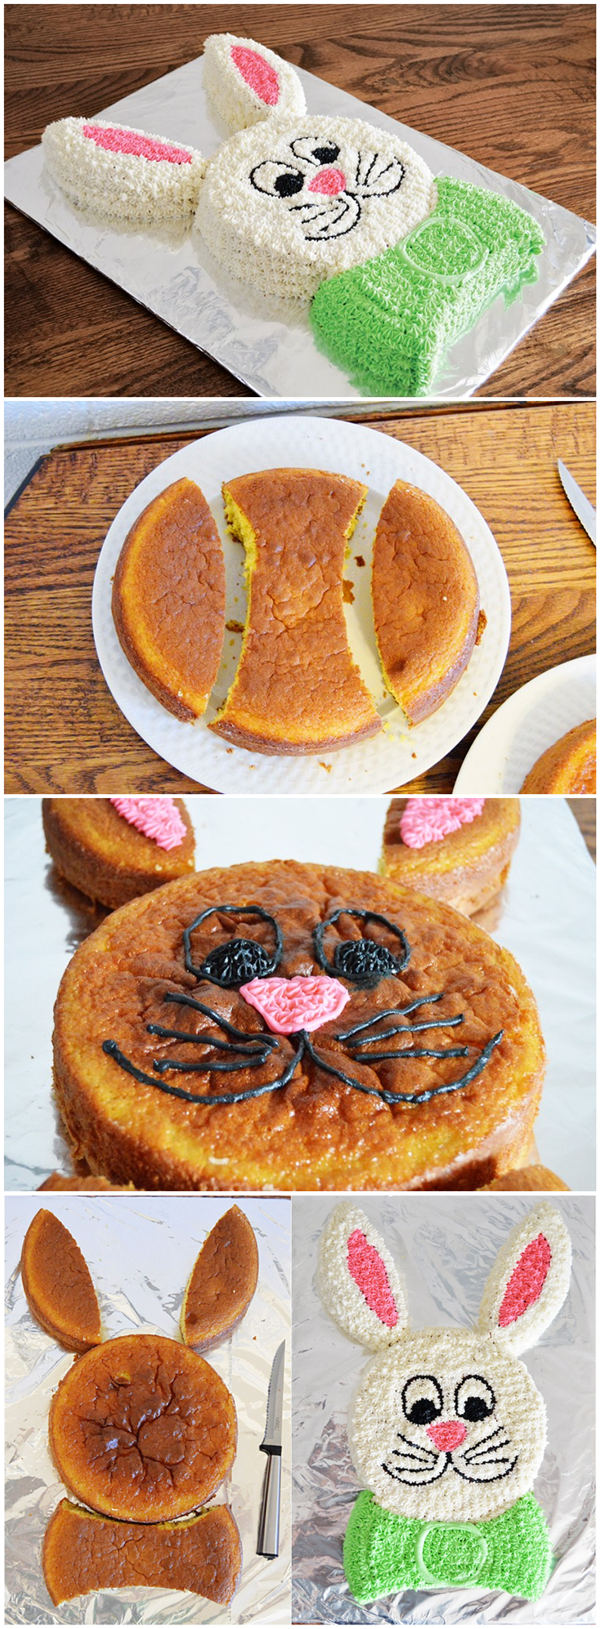 Bunny Cut Up Cake